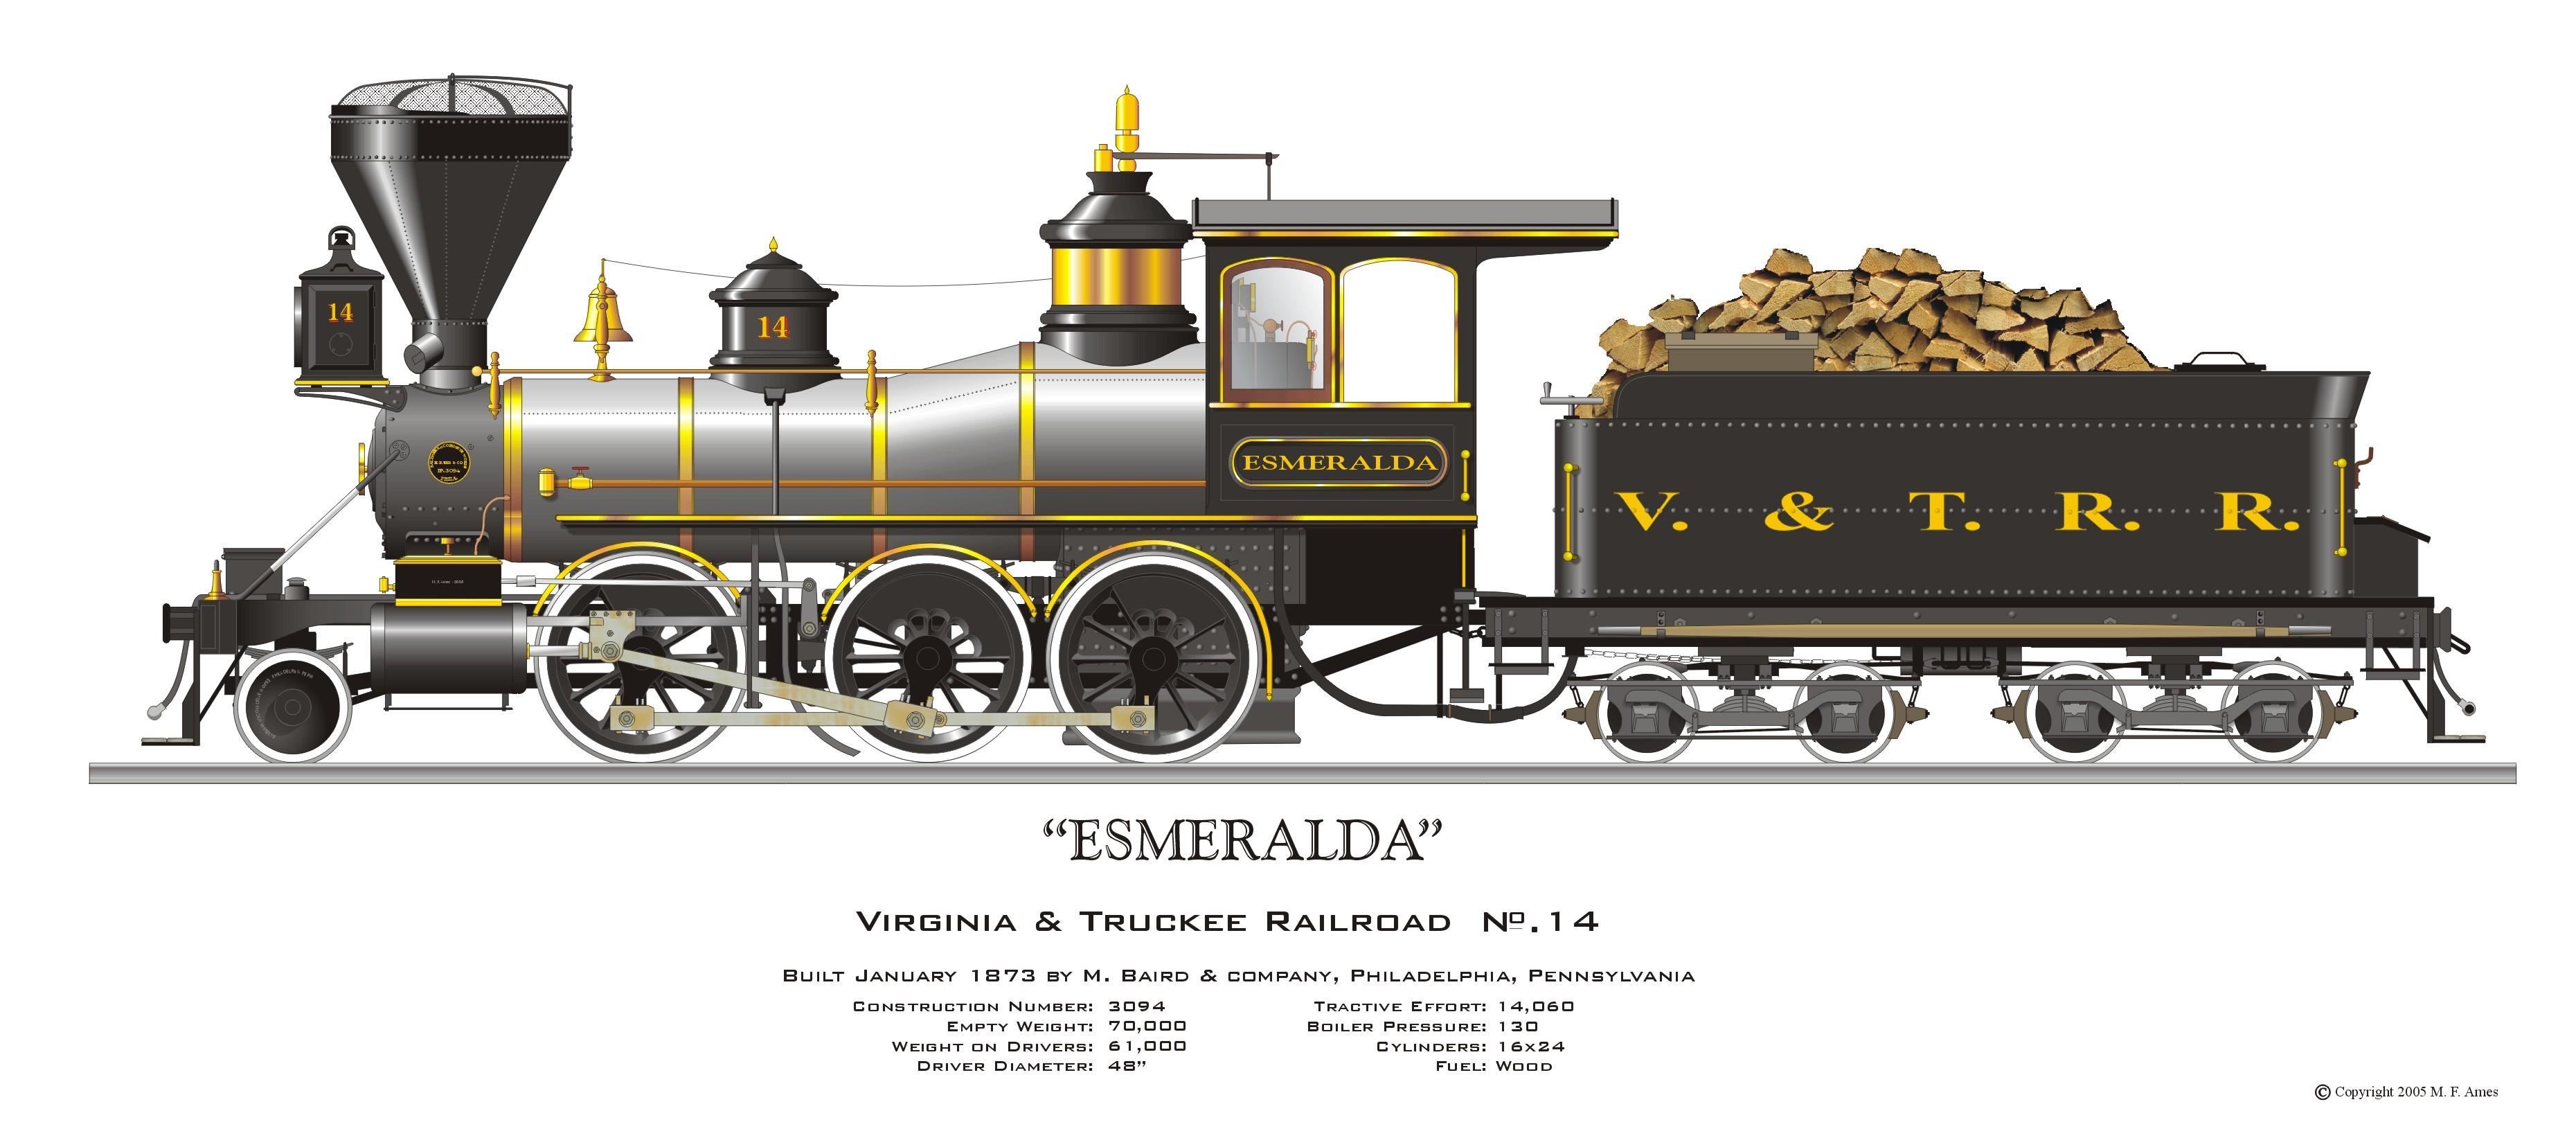 locomotive steam engine diagram train engine drawing at getdrawings